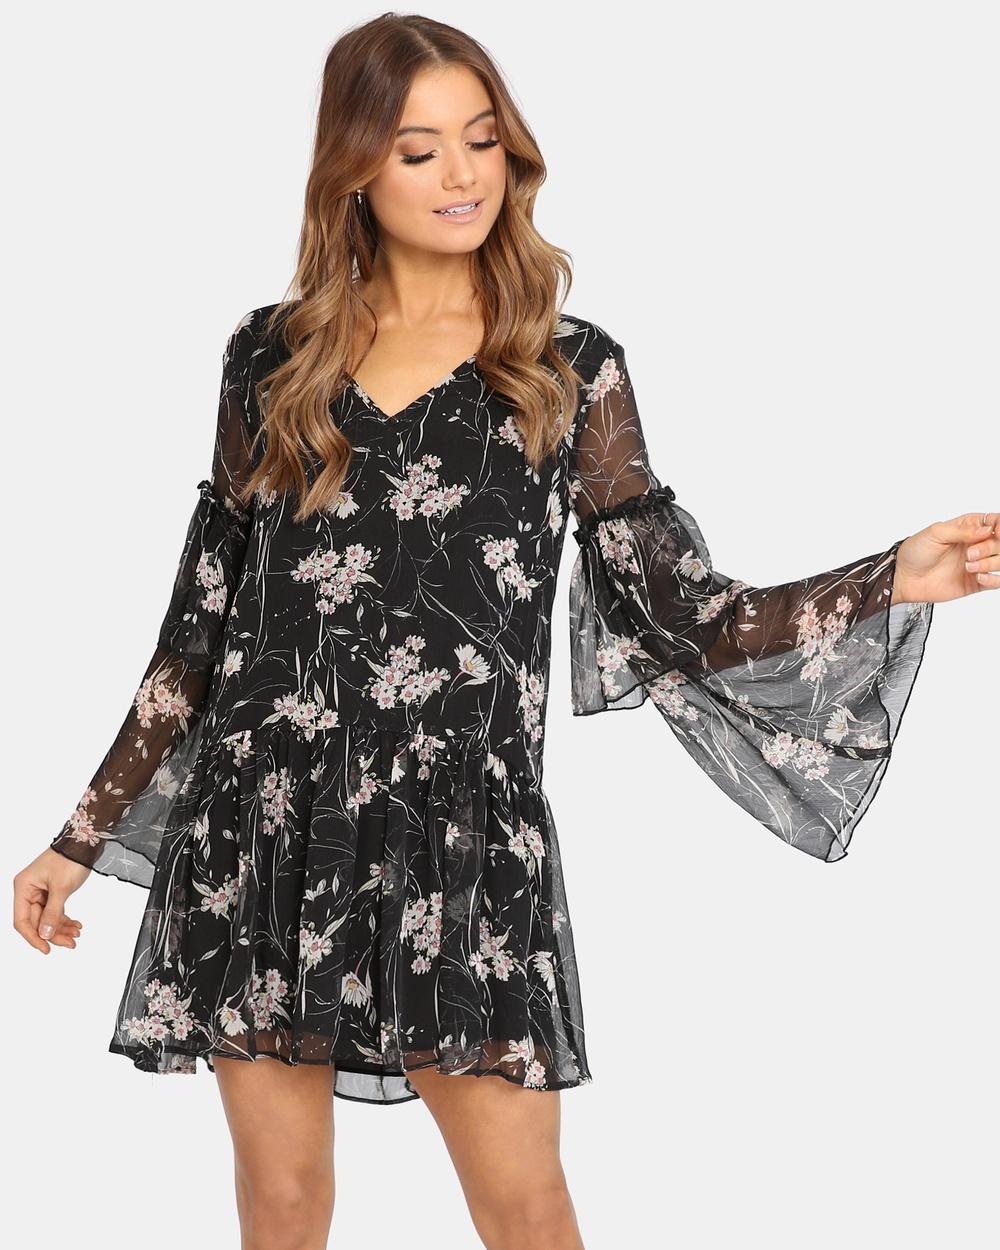 Madison Square Eden Dress Printed Dresses Black Eden Dress